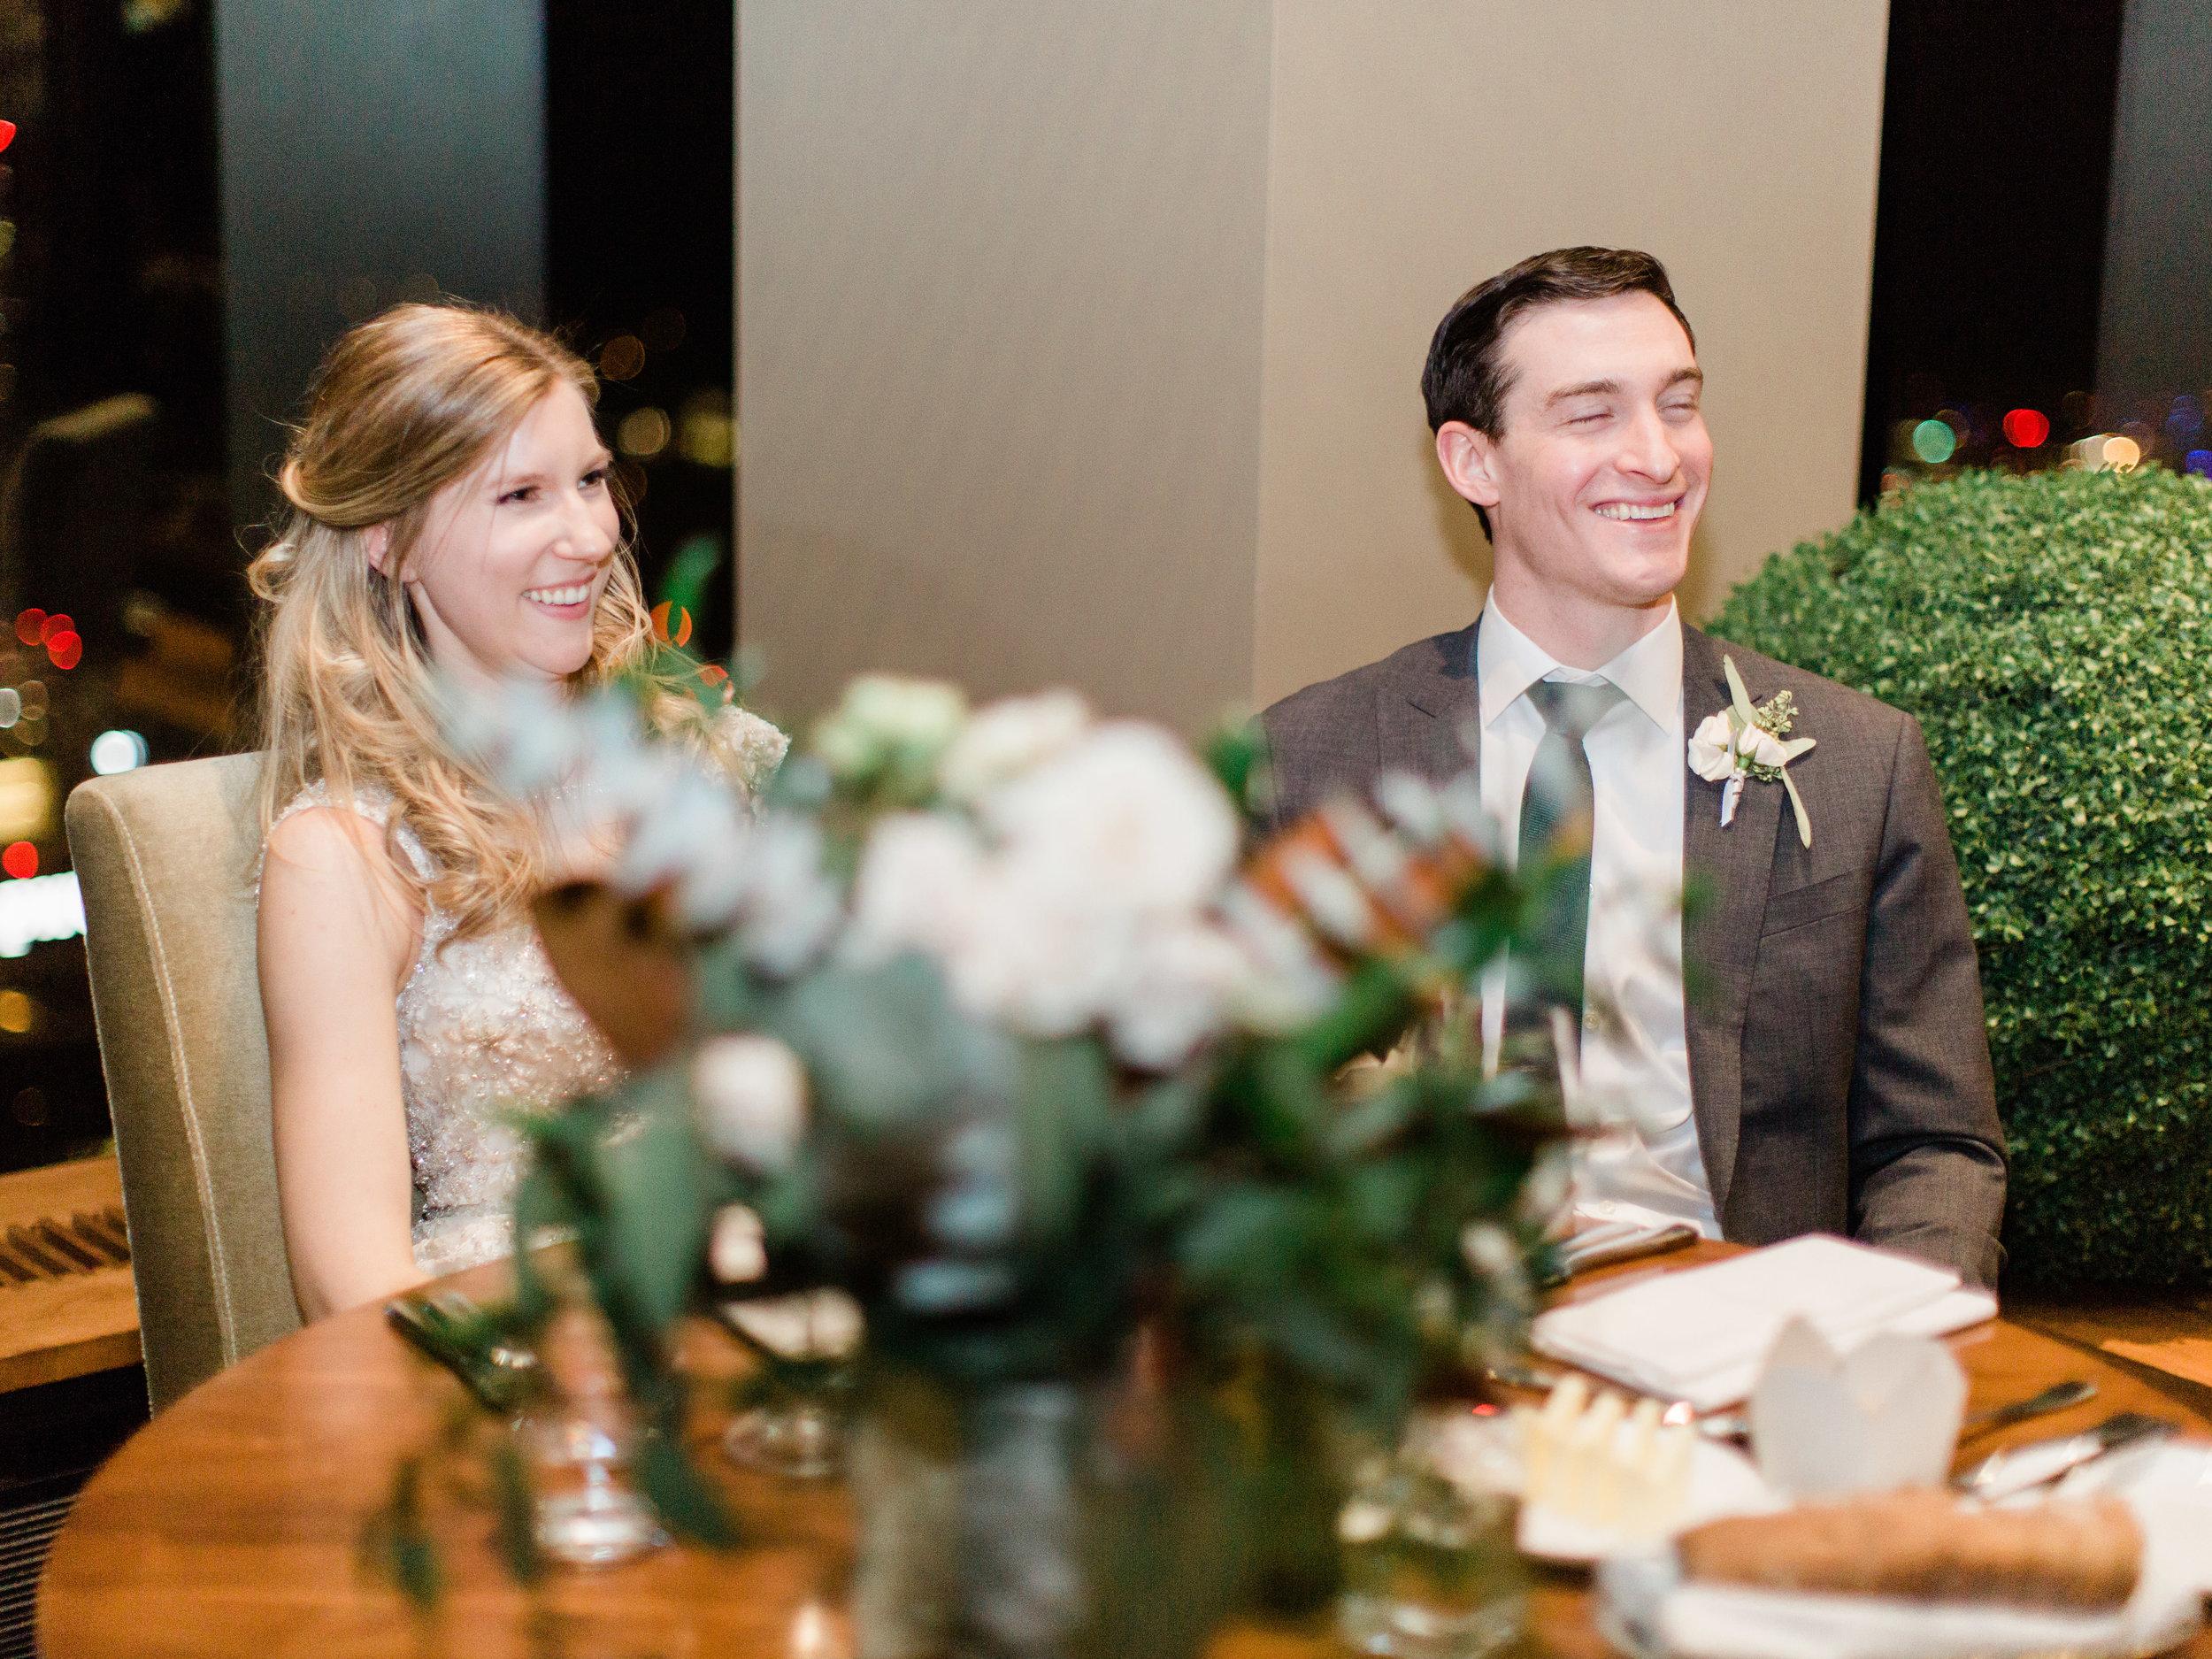 Toronto-wedding-photographer-downtown-winter-wedding-intimate-restaurant-canoe175.jpg